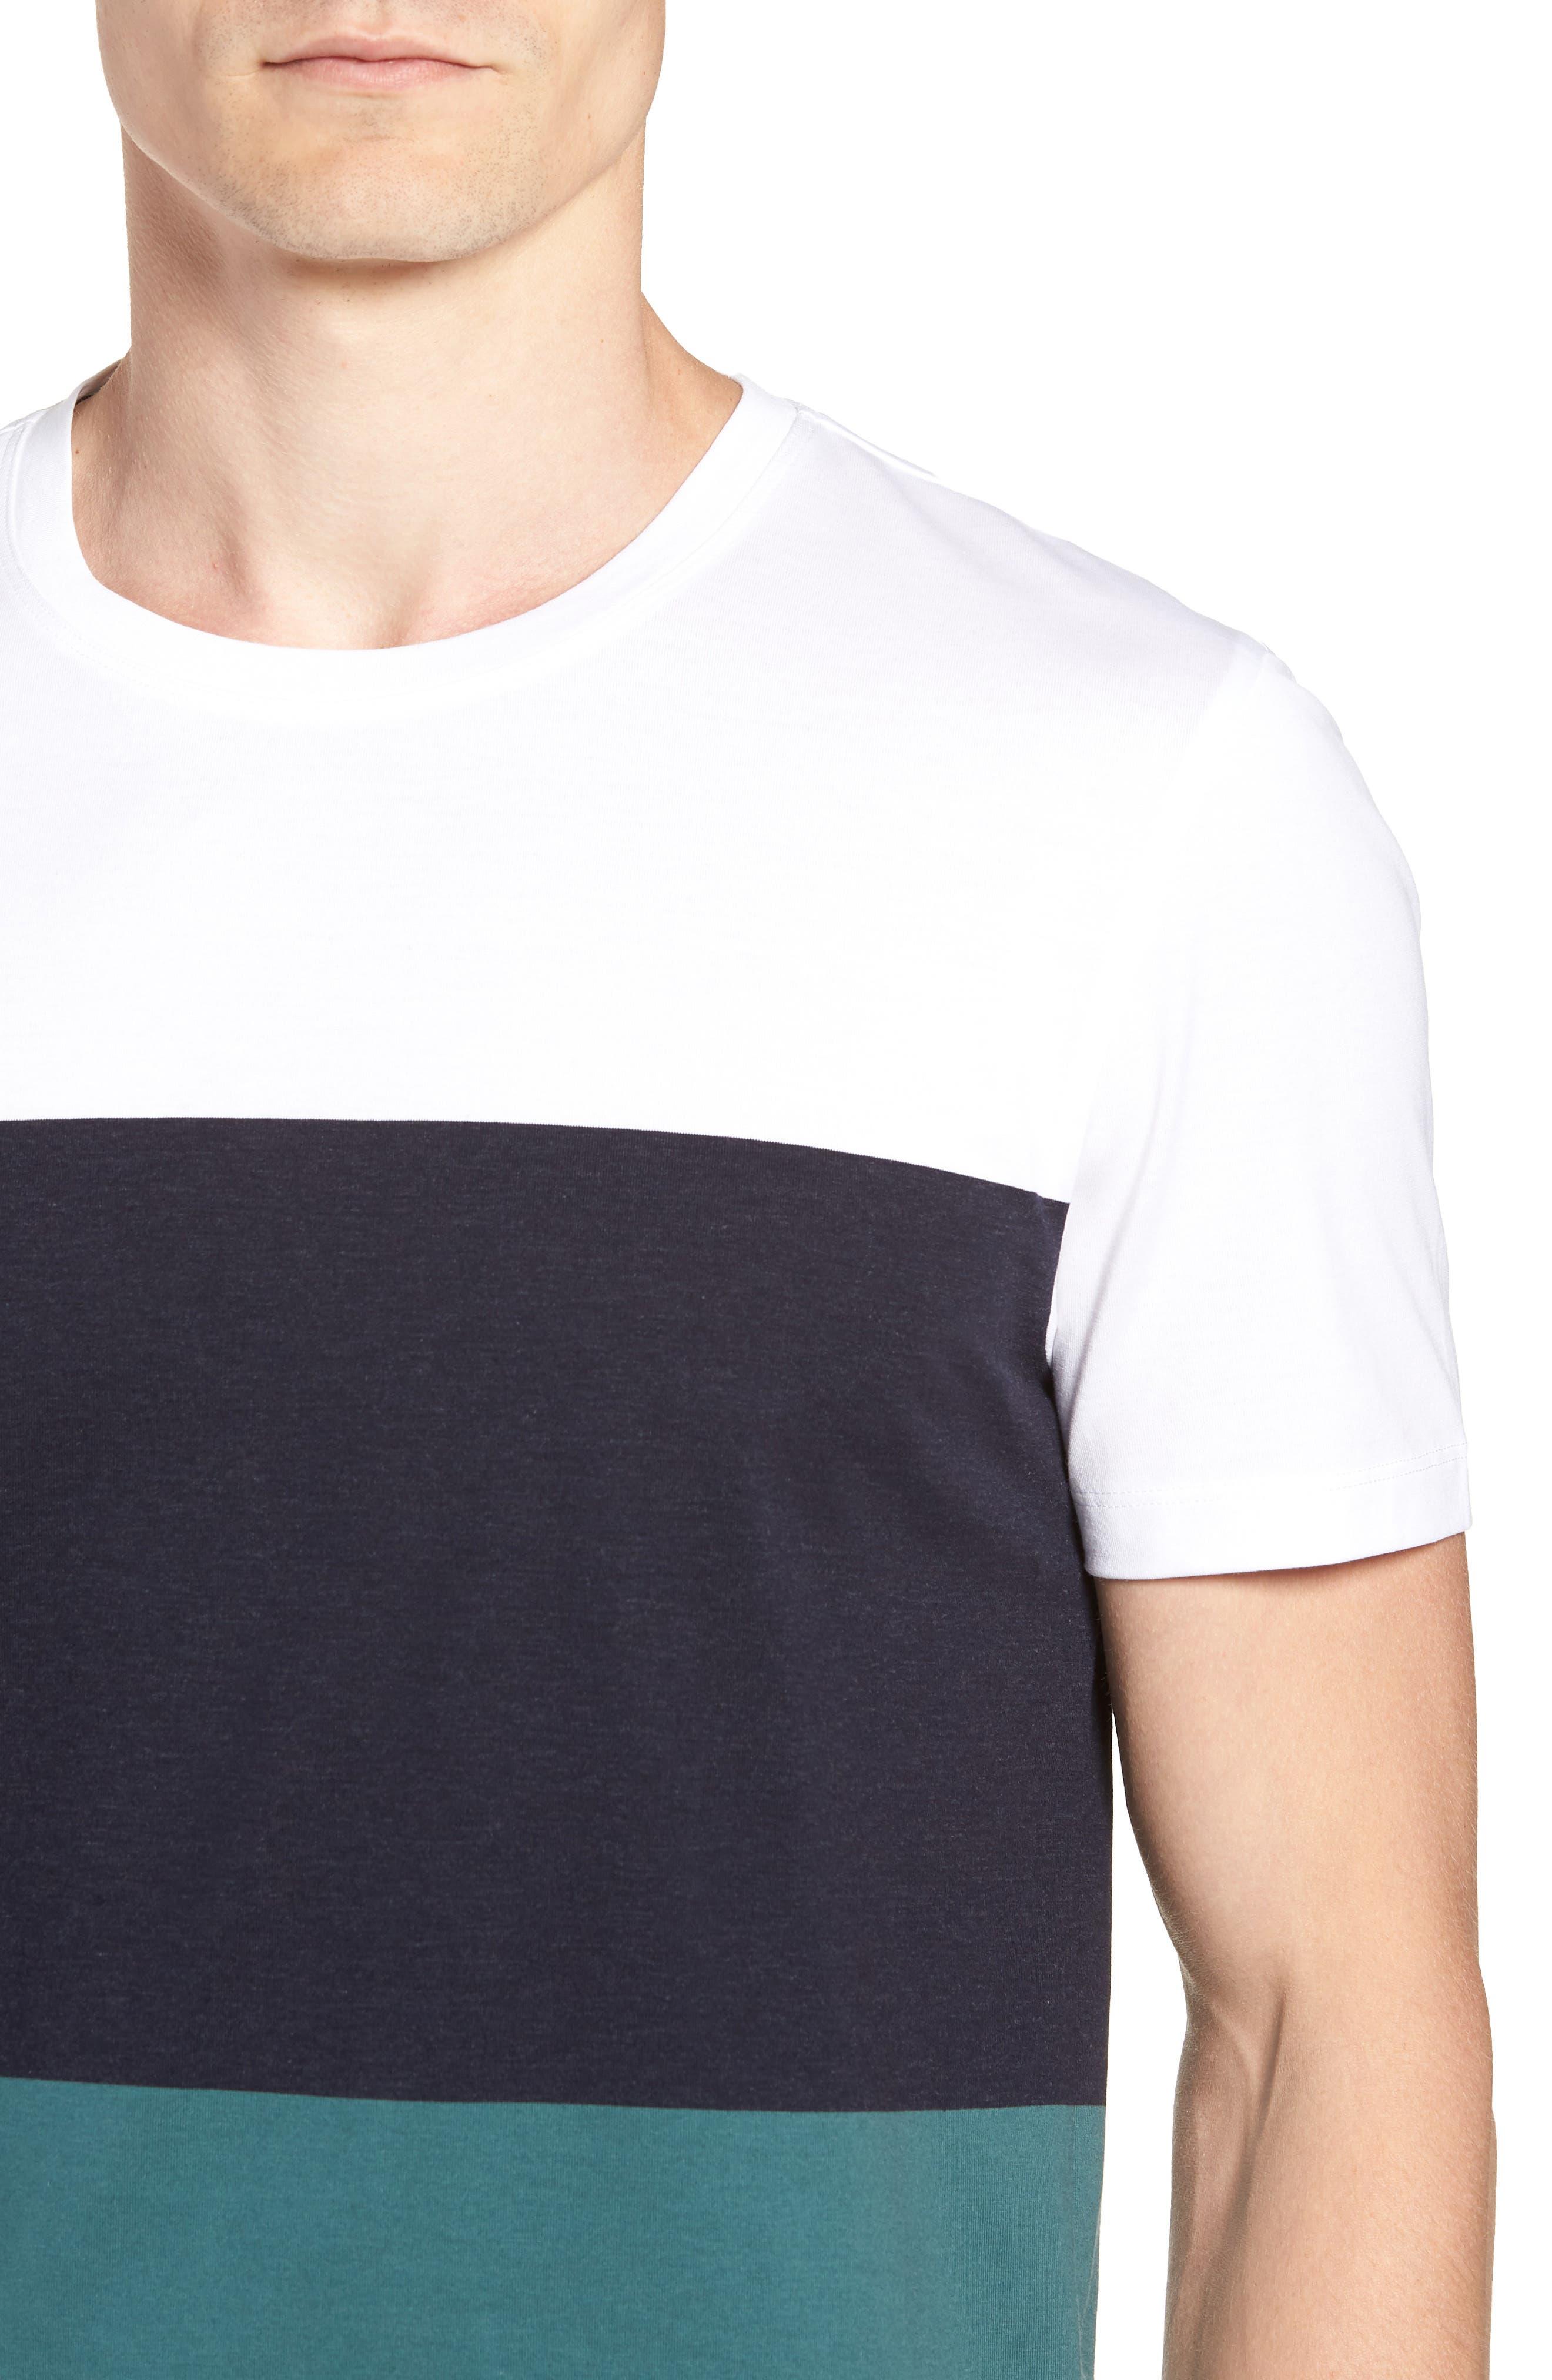 Tessler Colorblock Slim Fit T-Shirt,                             Alternate thumbnail 4, color,                             BLUE